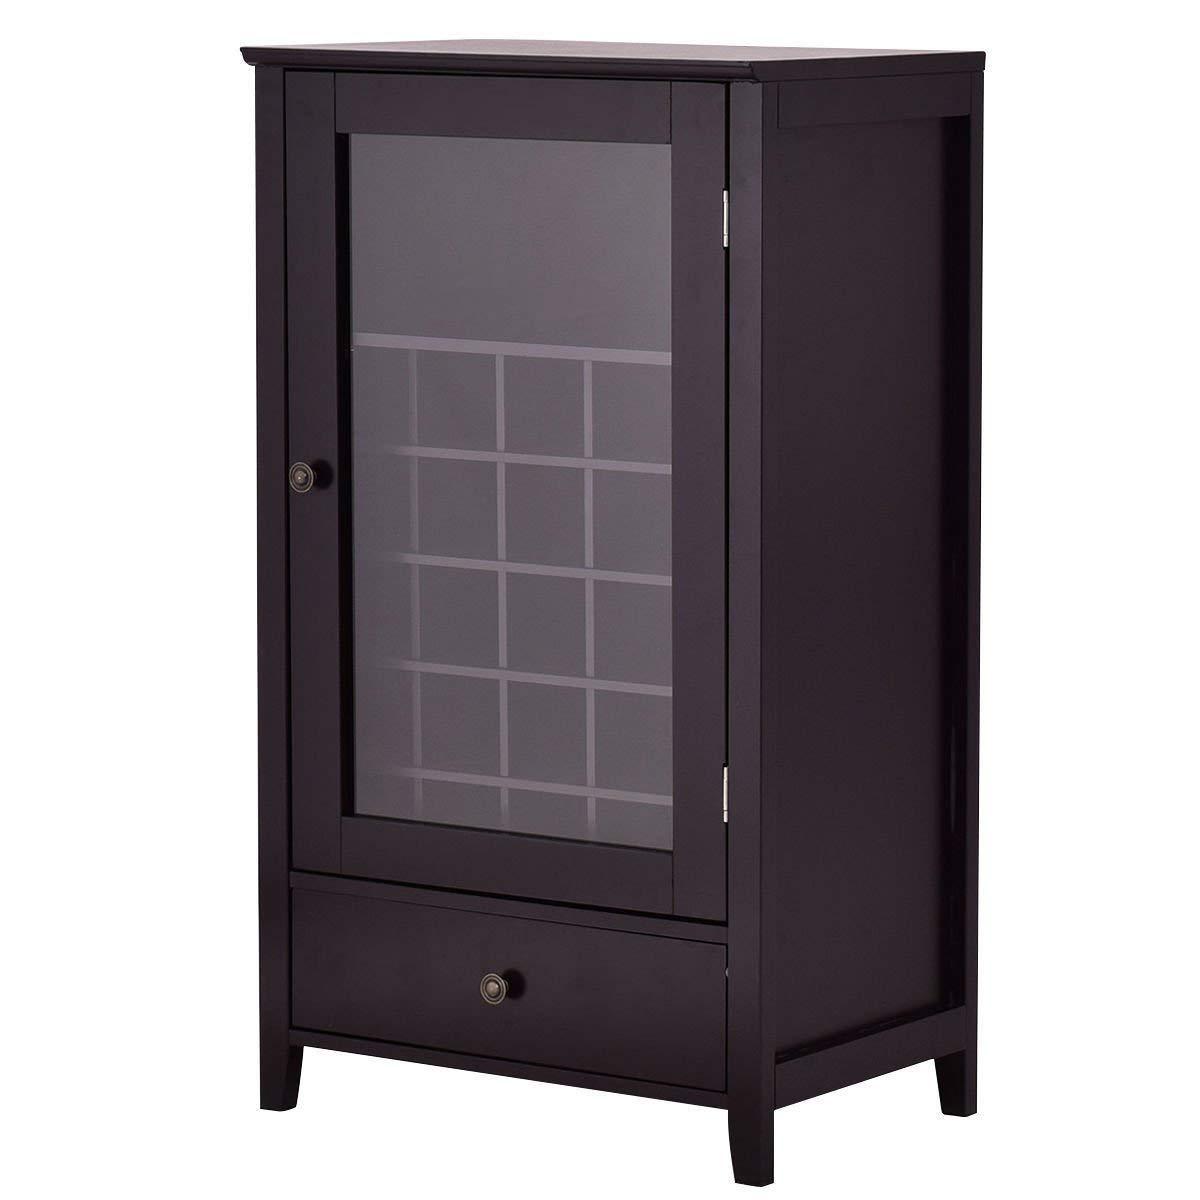 Get Quotations Wine Cabinet Storage Shelf Bottle Holder With Drawer Kitchen Home Bar Wood Brown